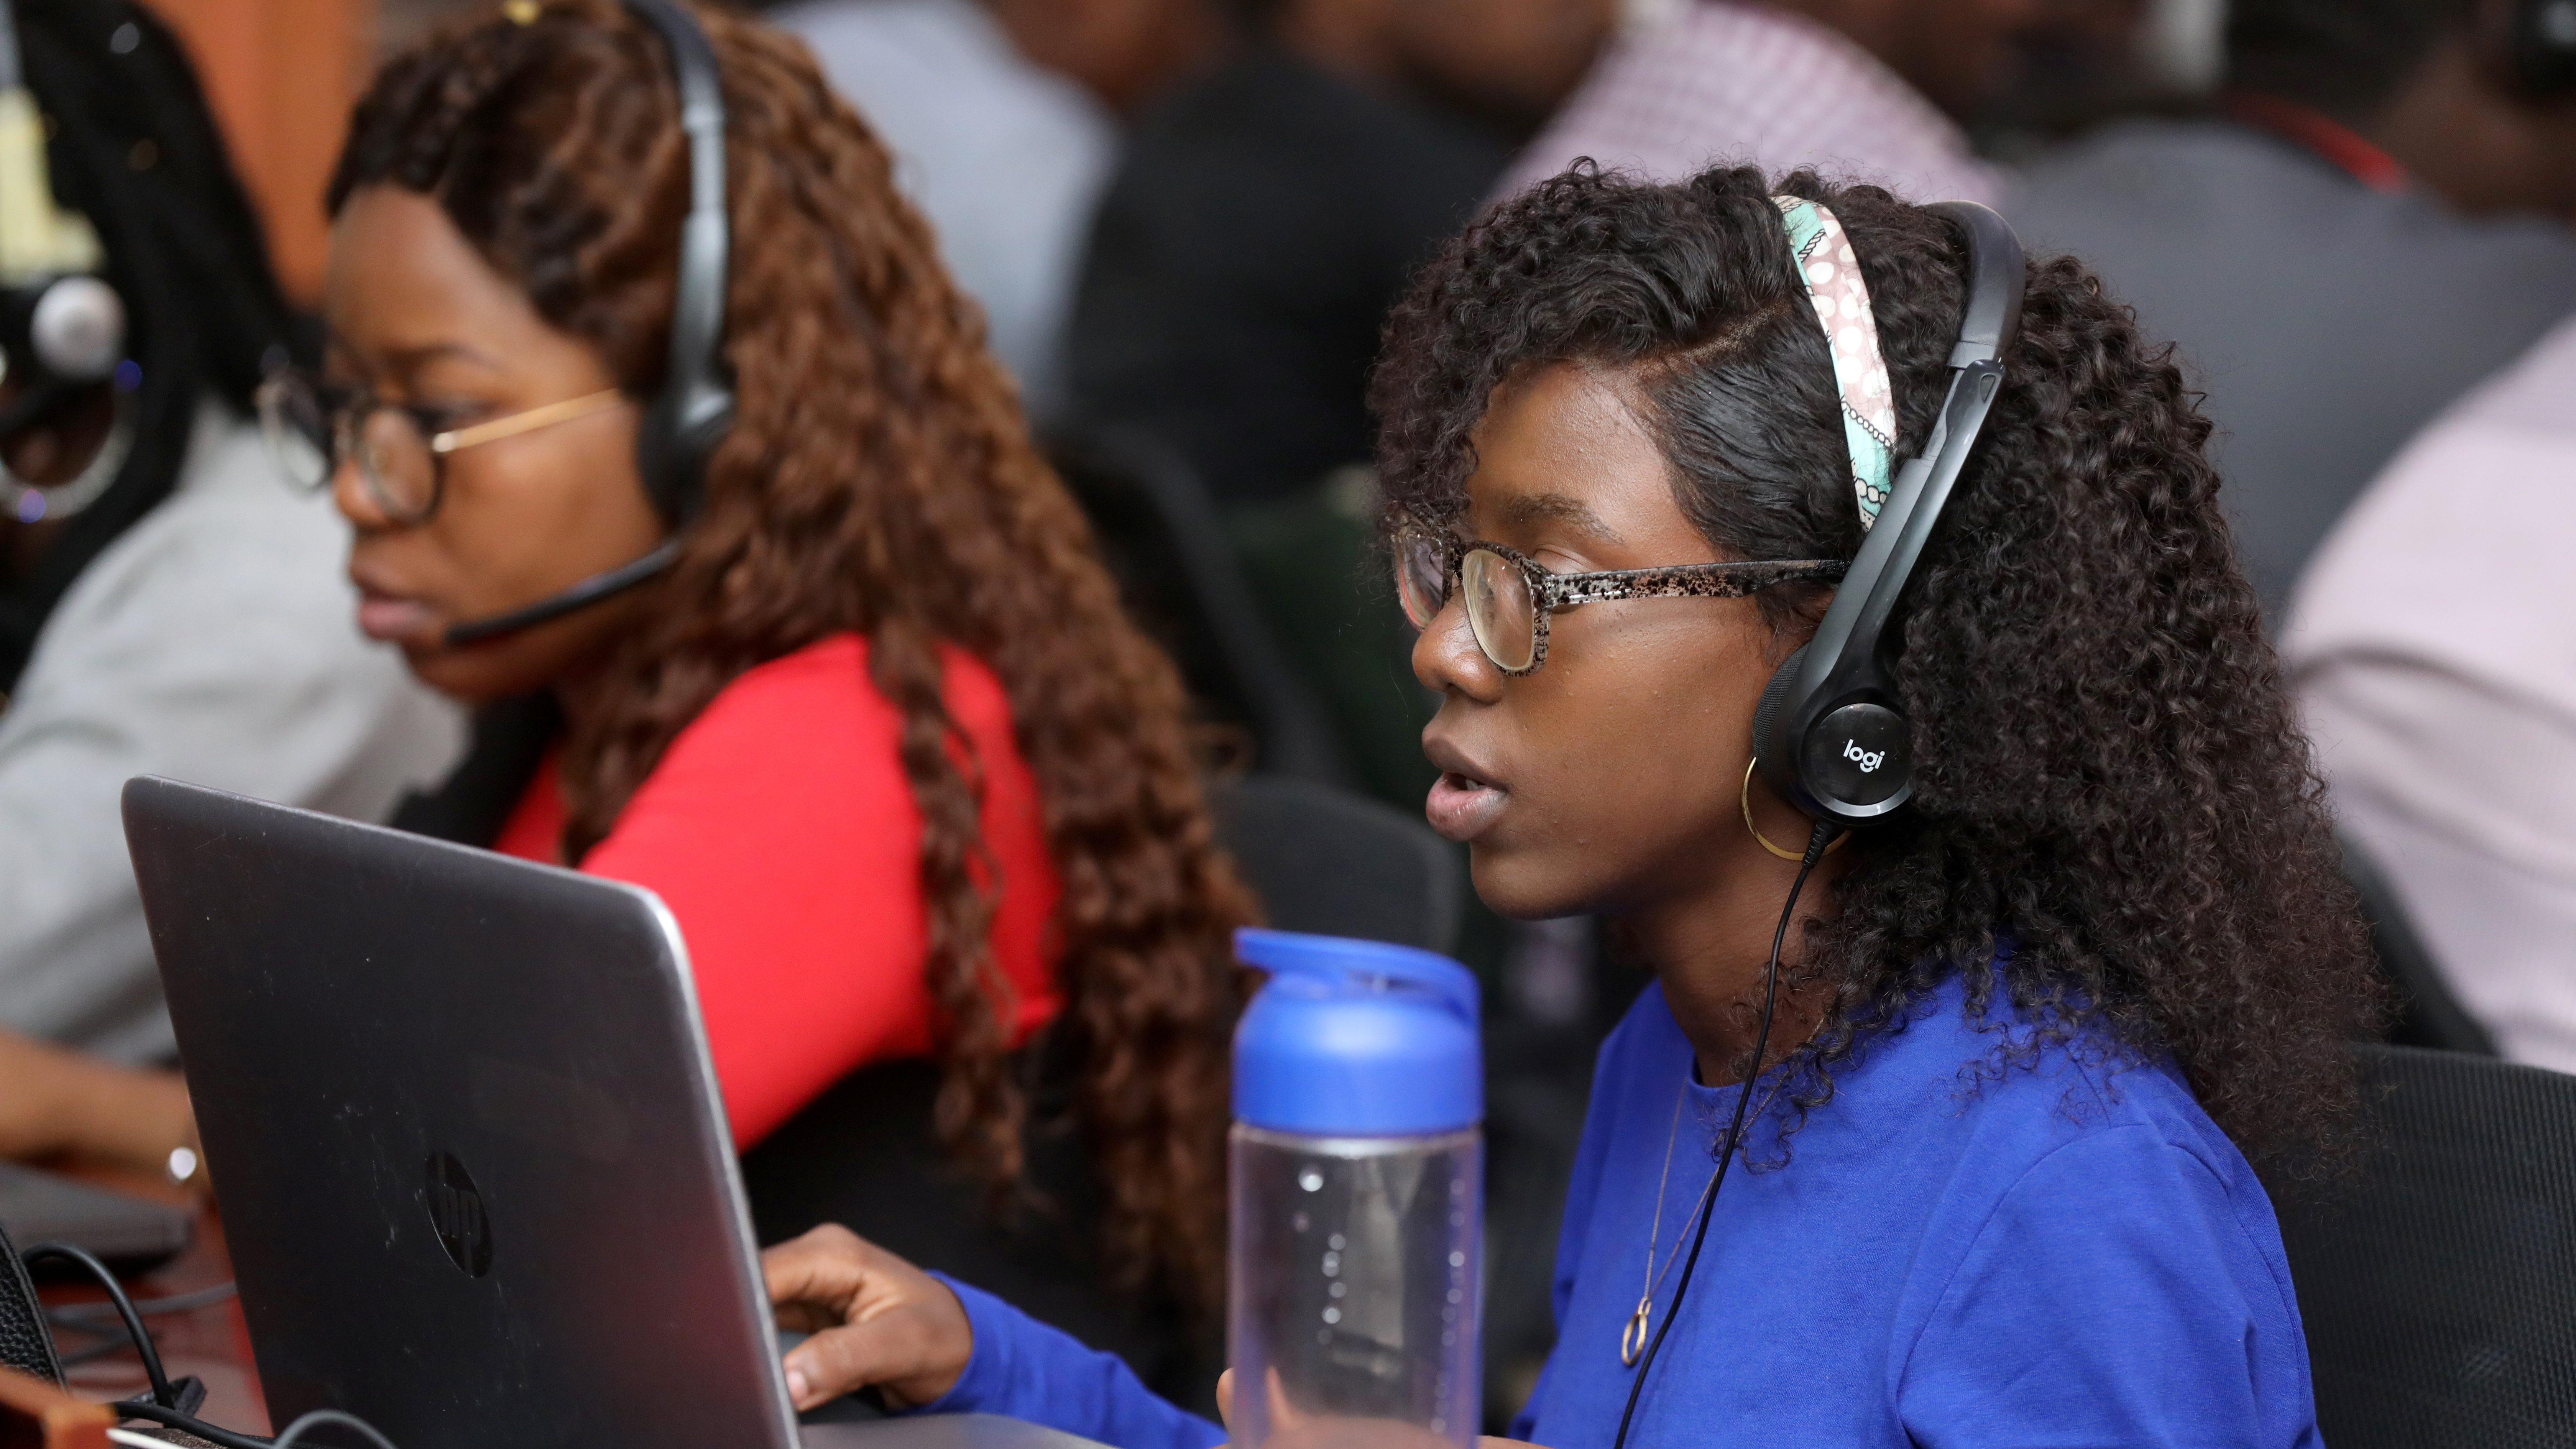 Jumia customer service agents in Lagos.